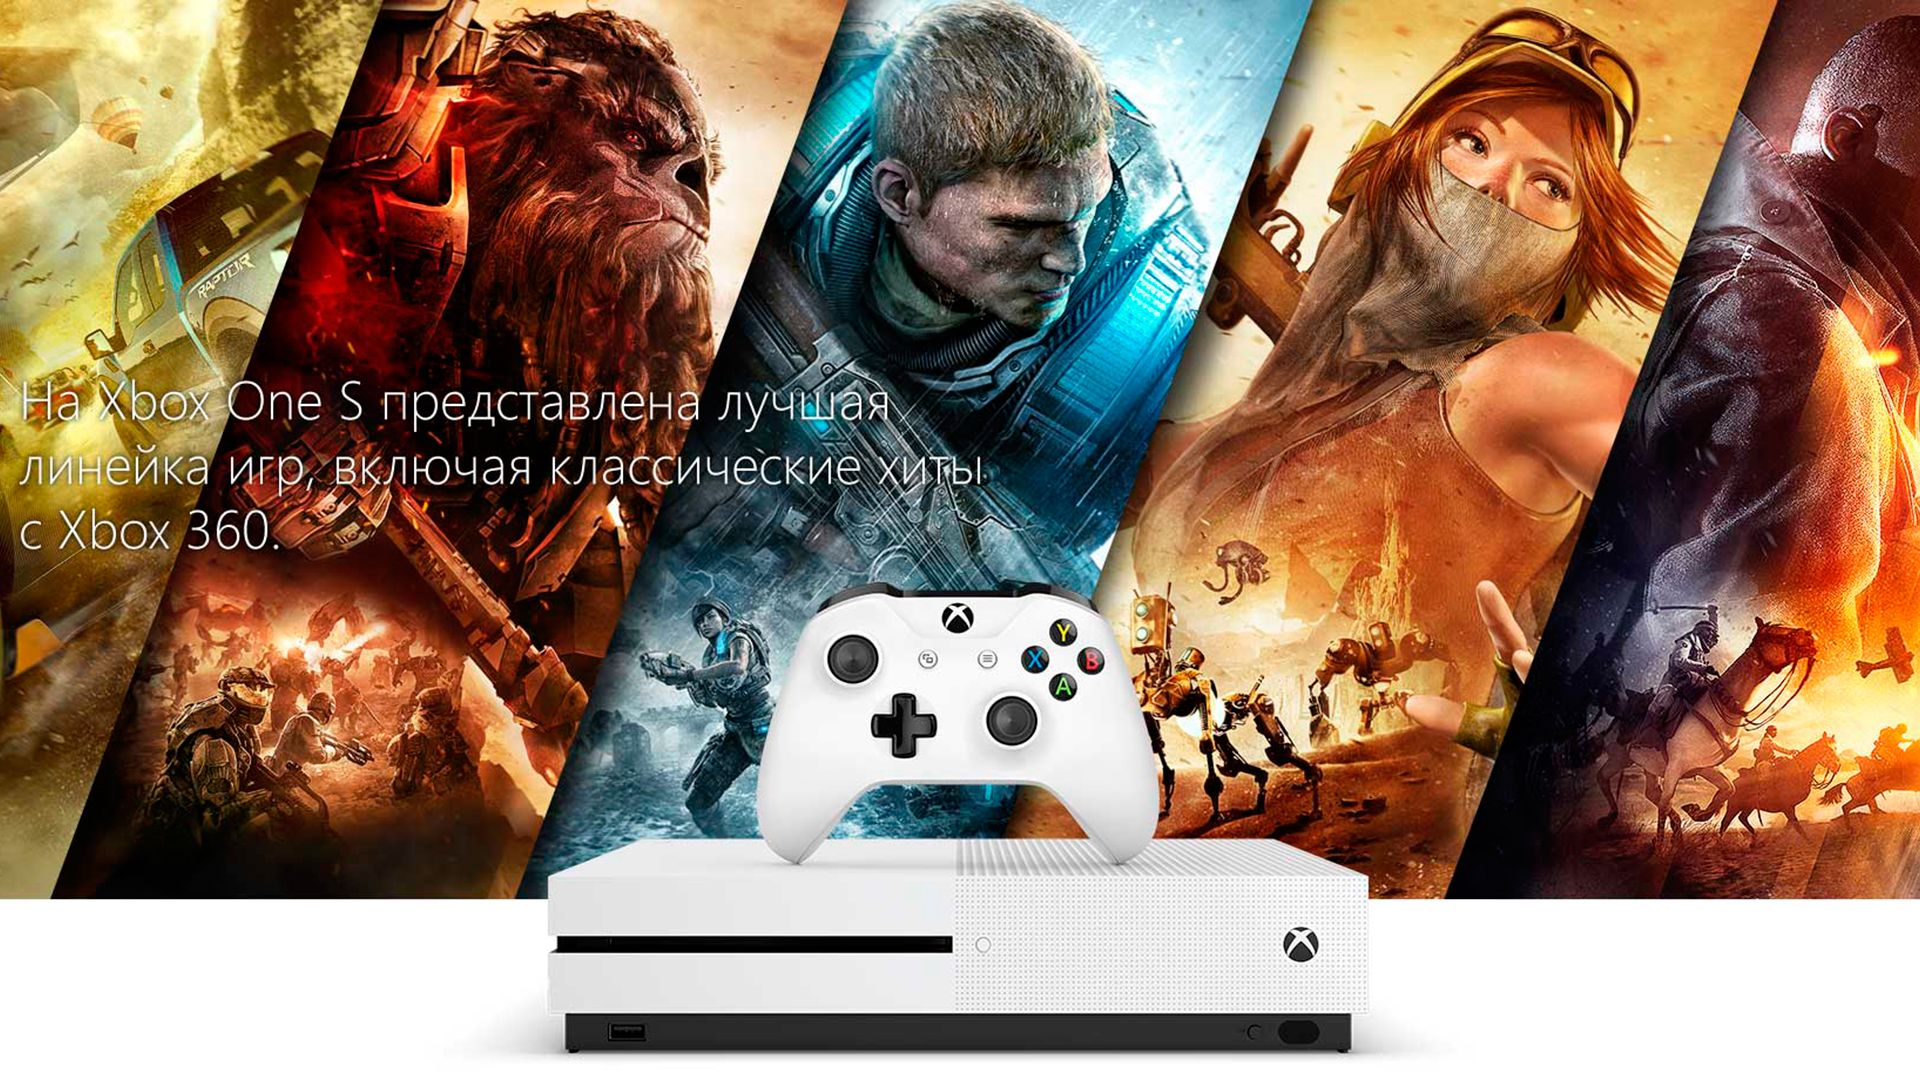 Xbox One S 1Tb FIFA 17 изображение 5